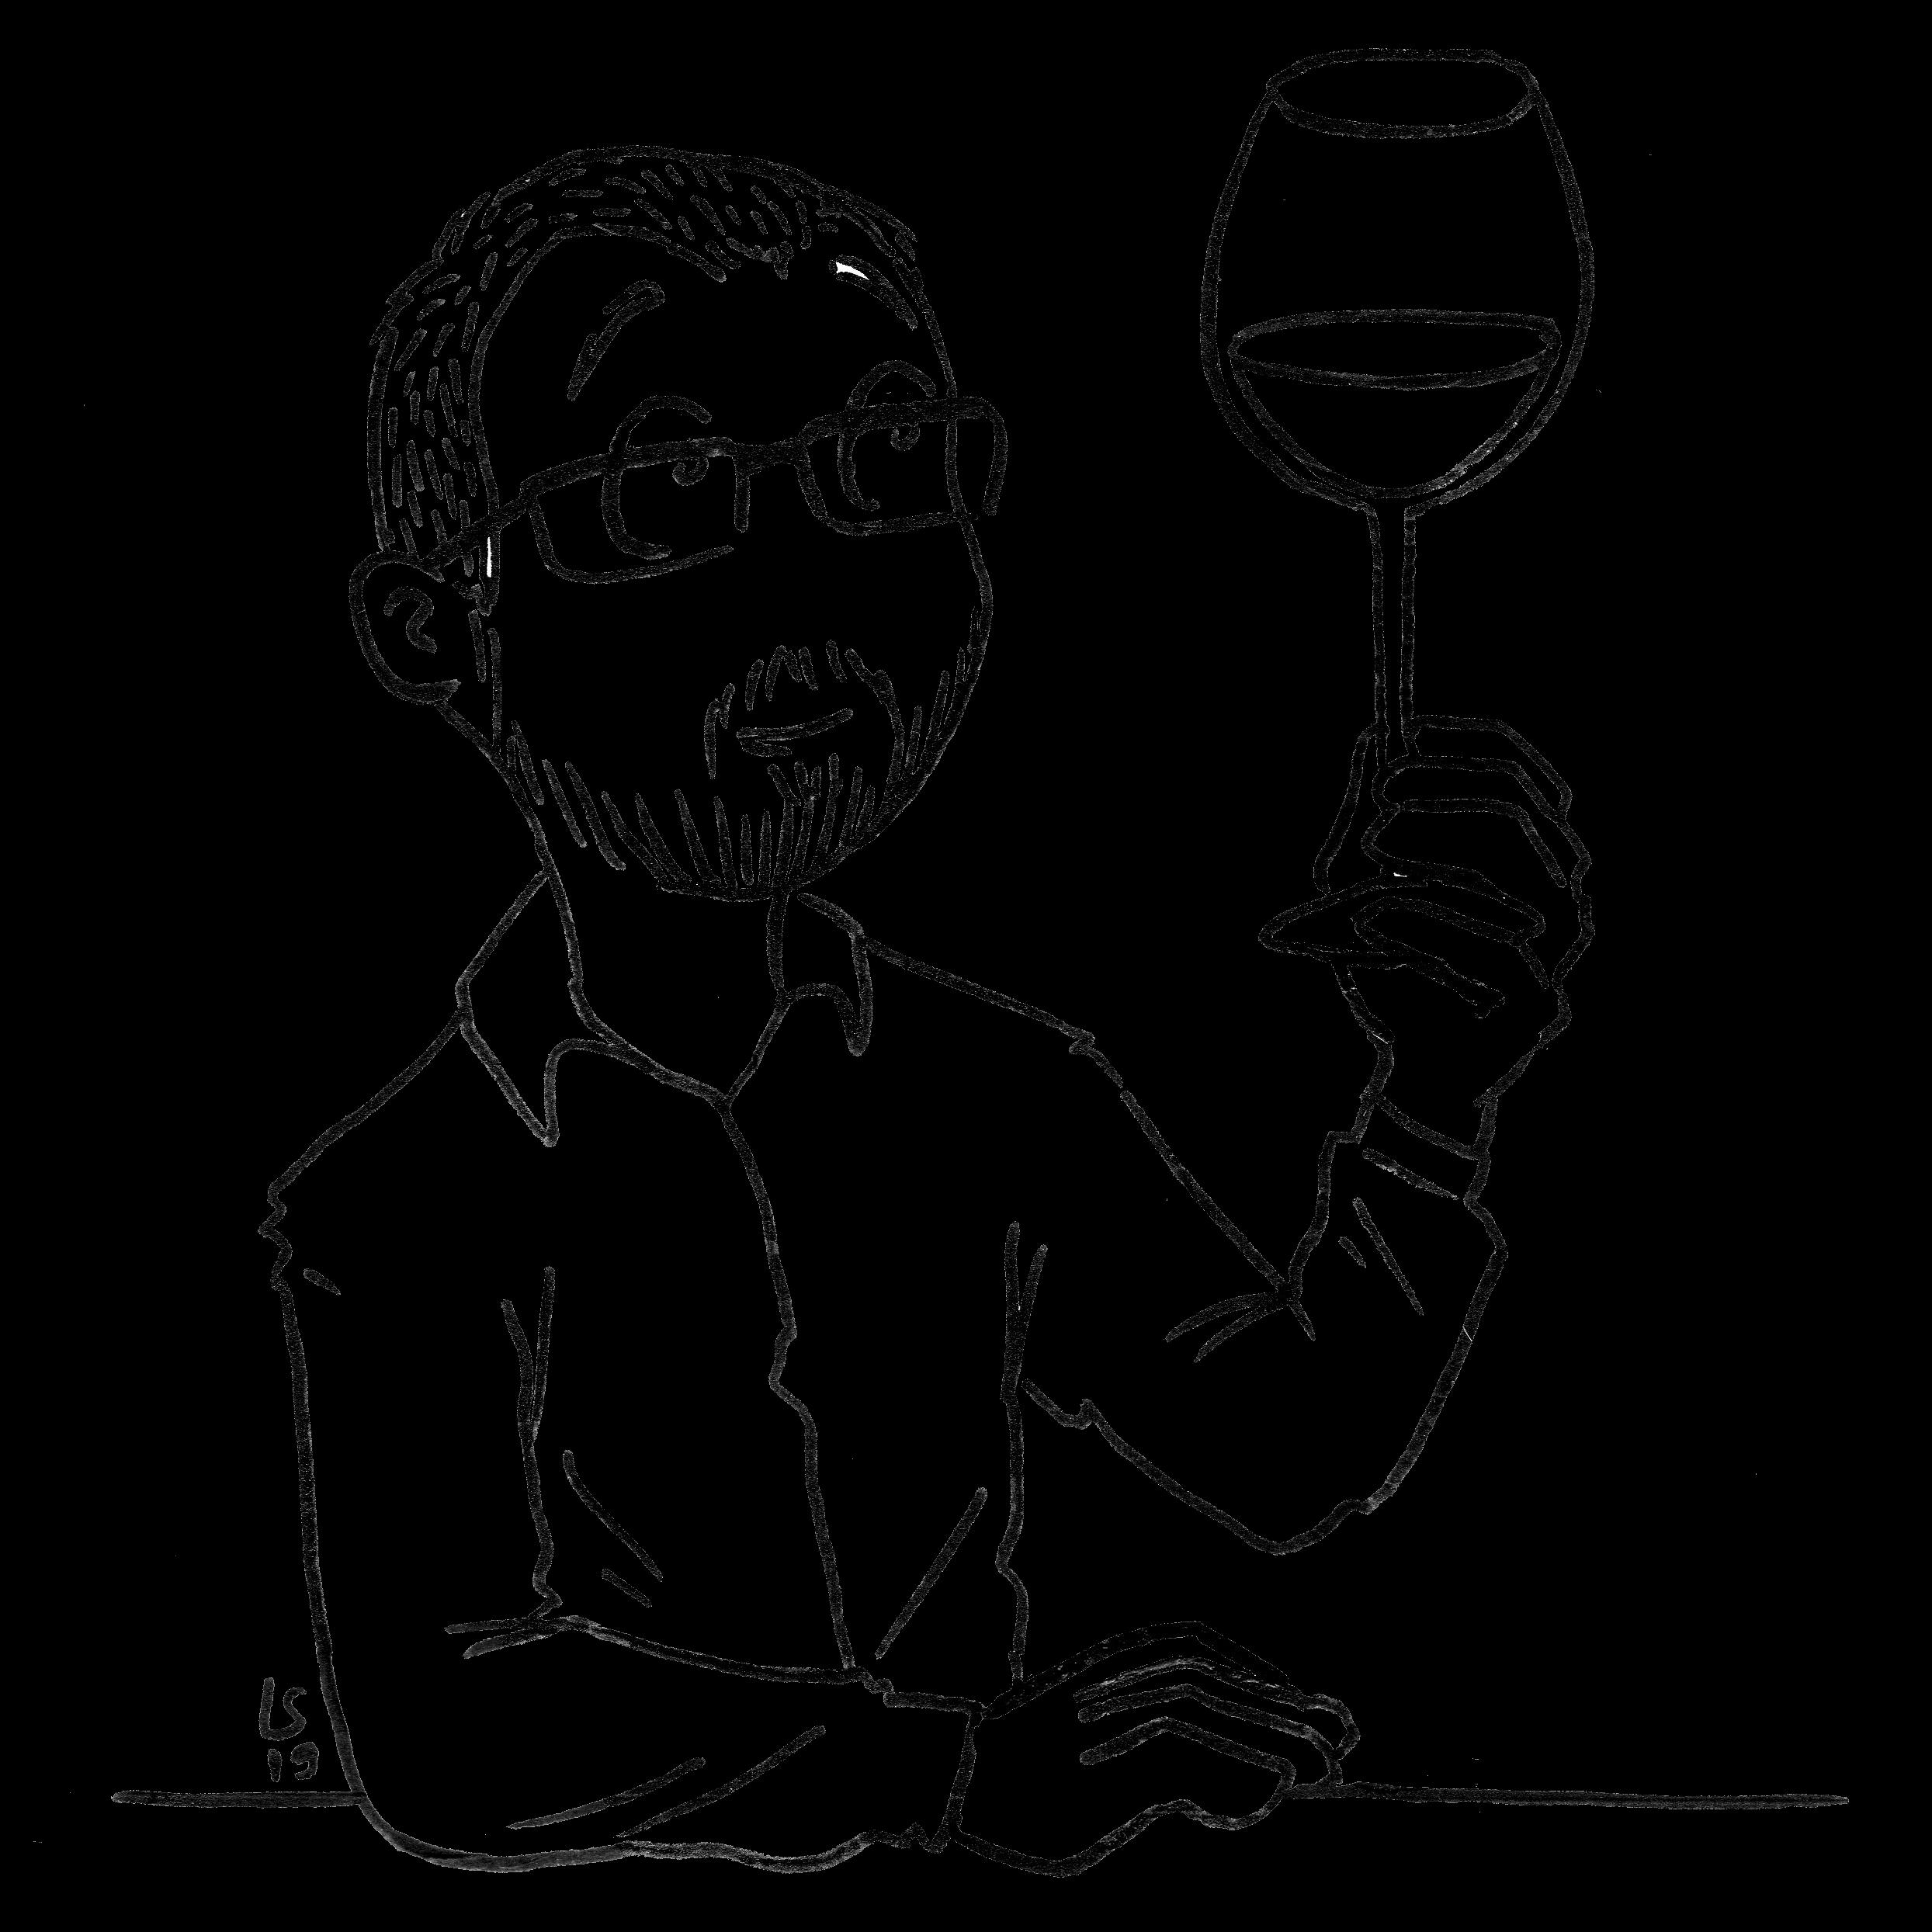 Vinifika-wijntasting-zicht-transparant